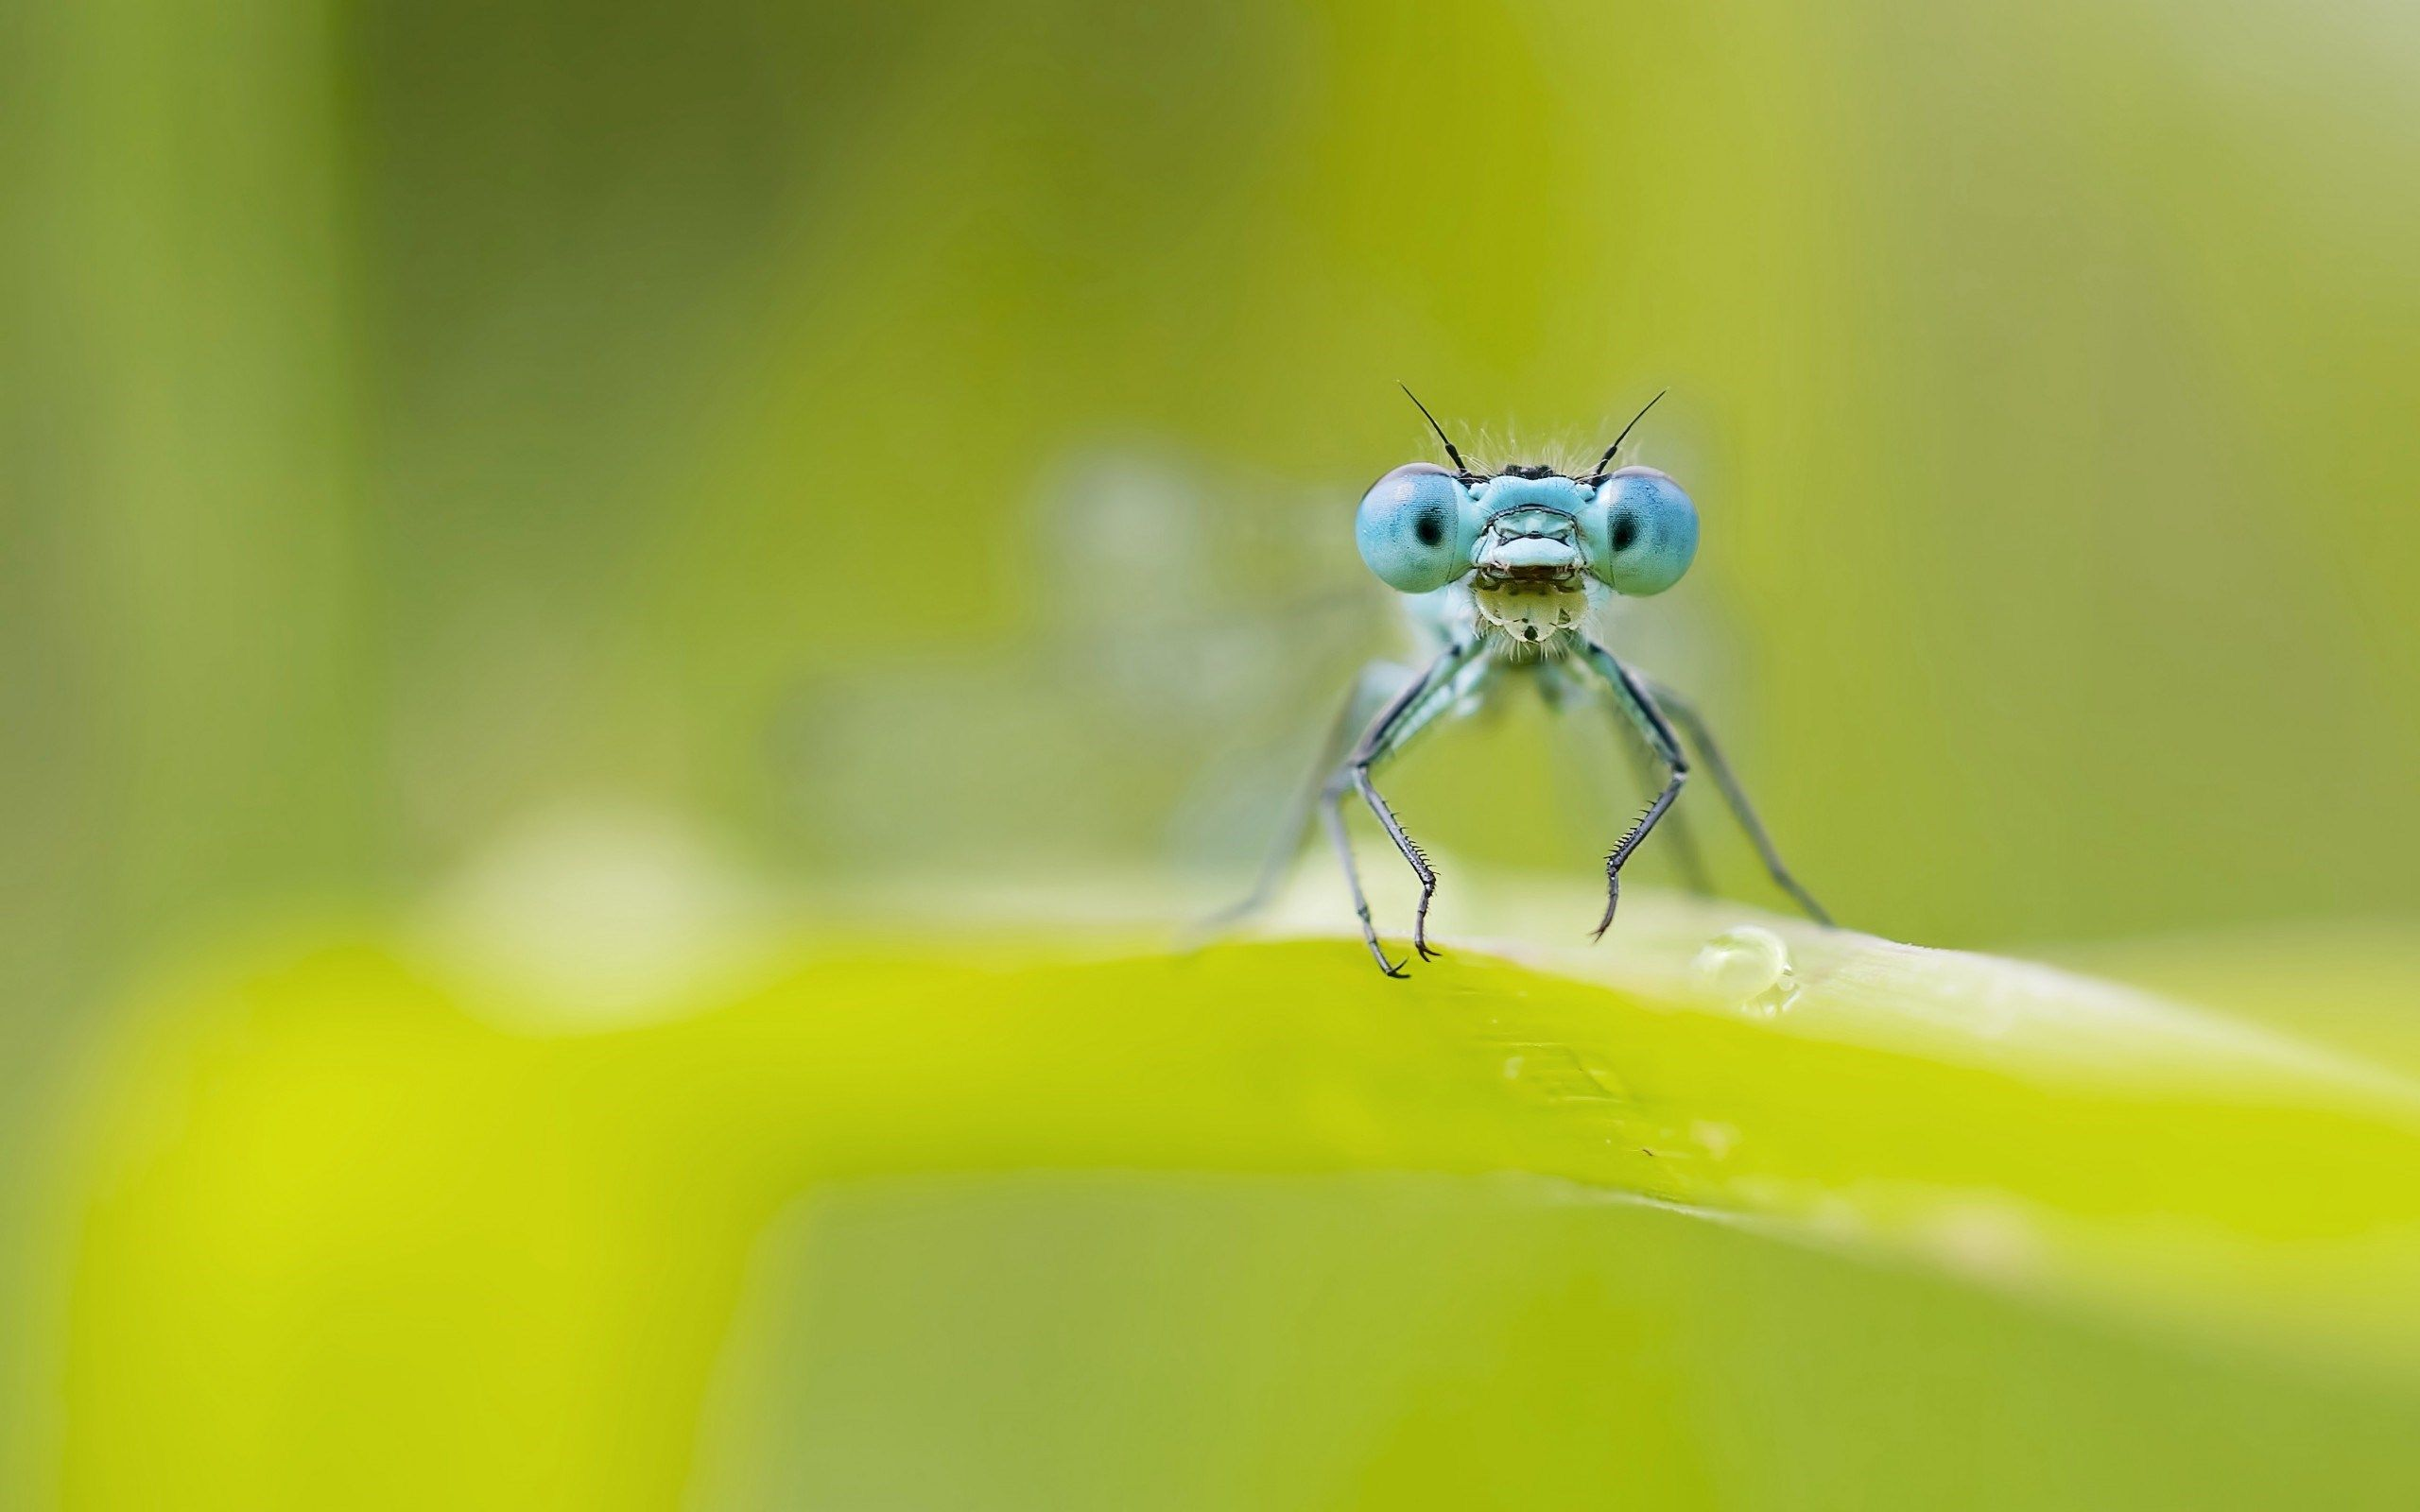 dragonfly, animals, nature, macro, drop, morning, photo, beauty